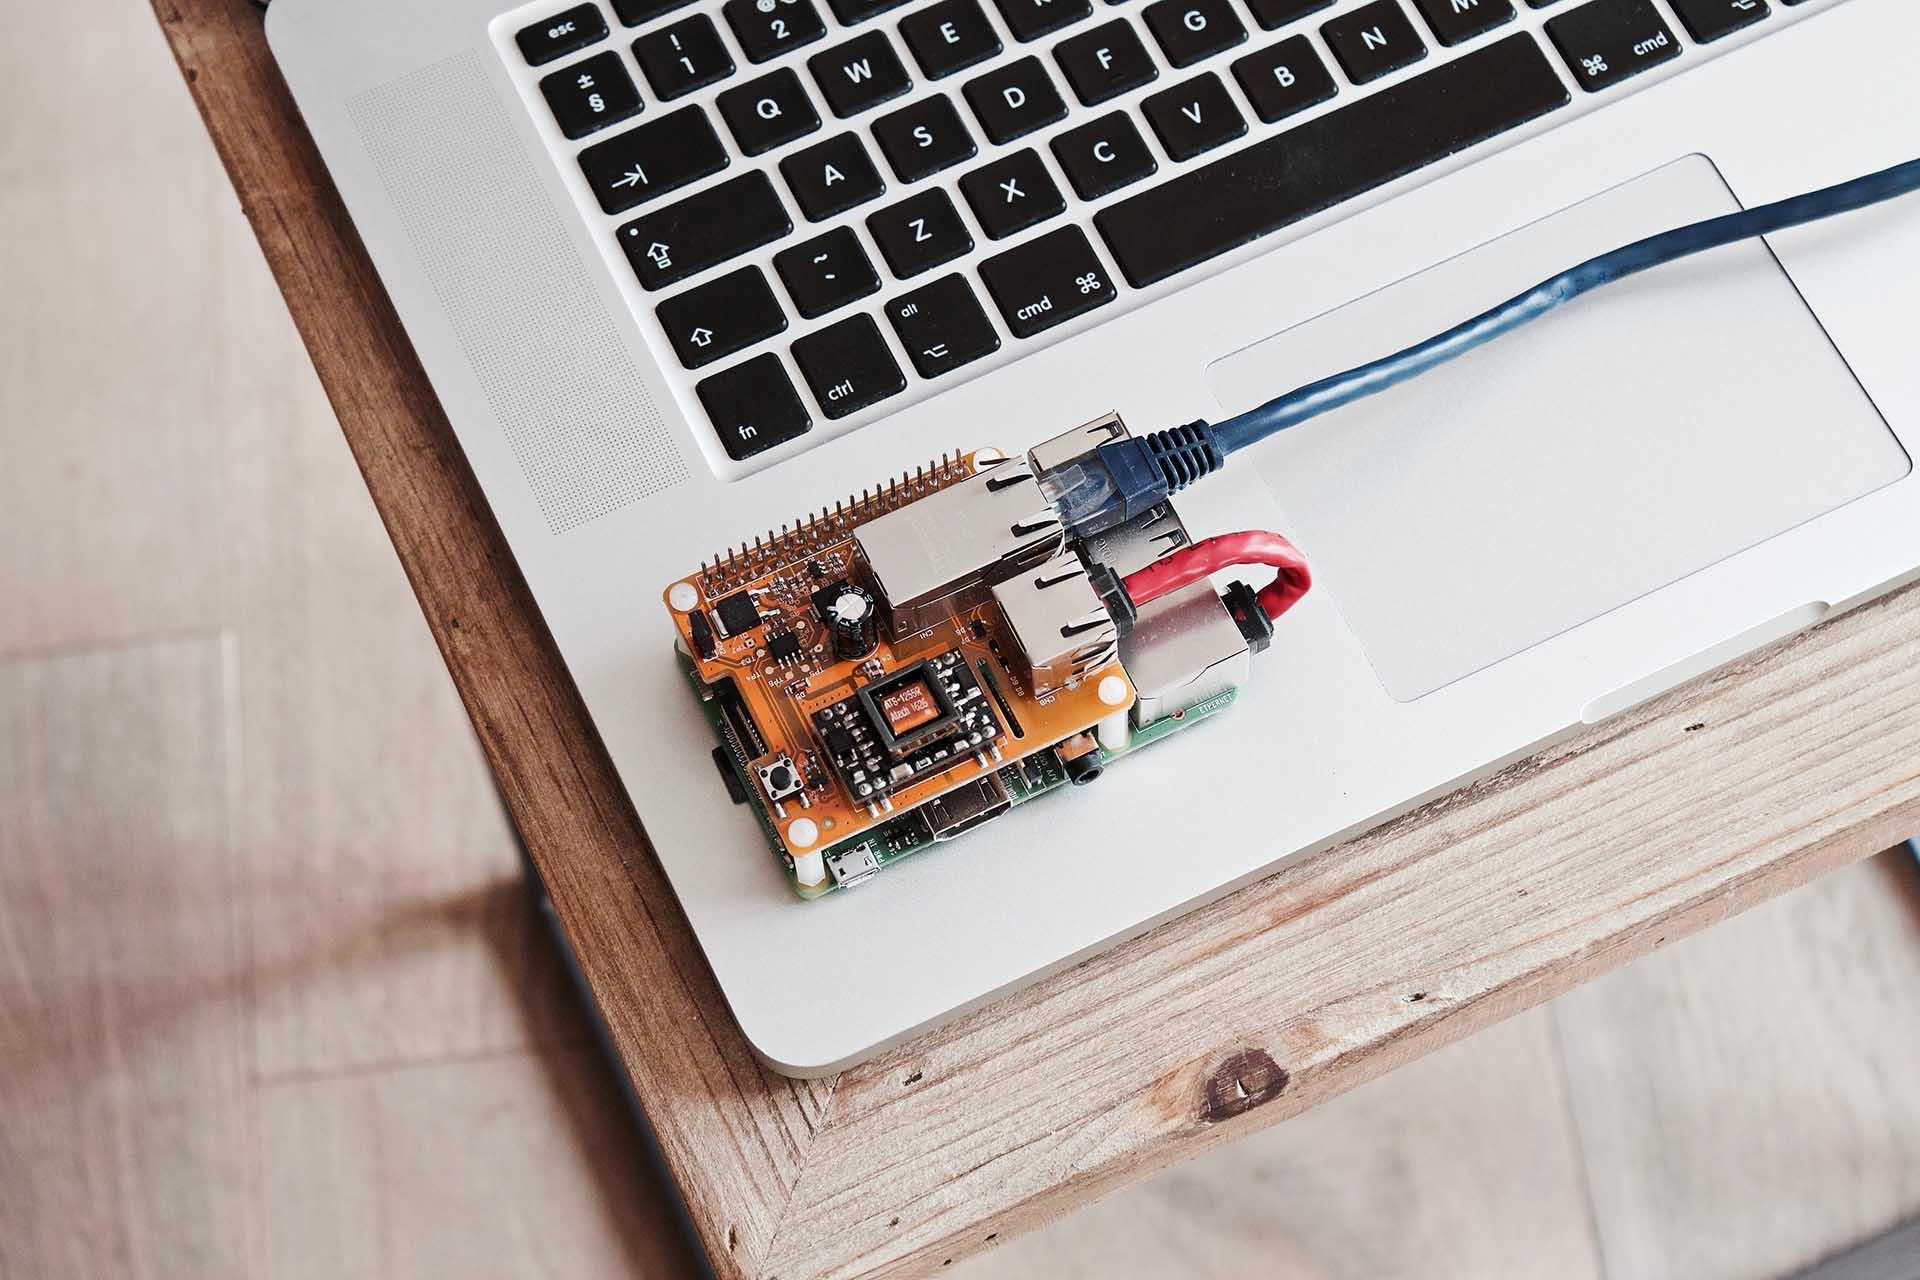 t2informatik Blog: CI/CD pipeline on a Raspberry Pi - Part 4